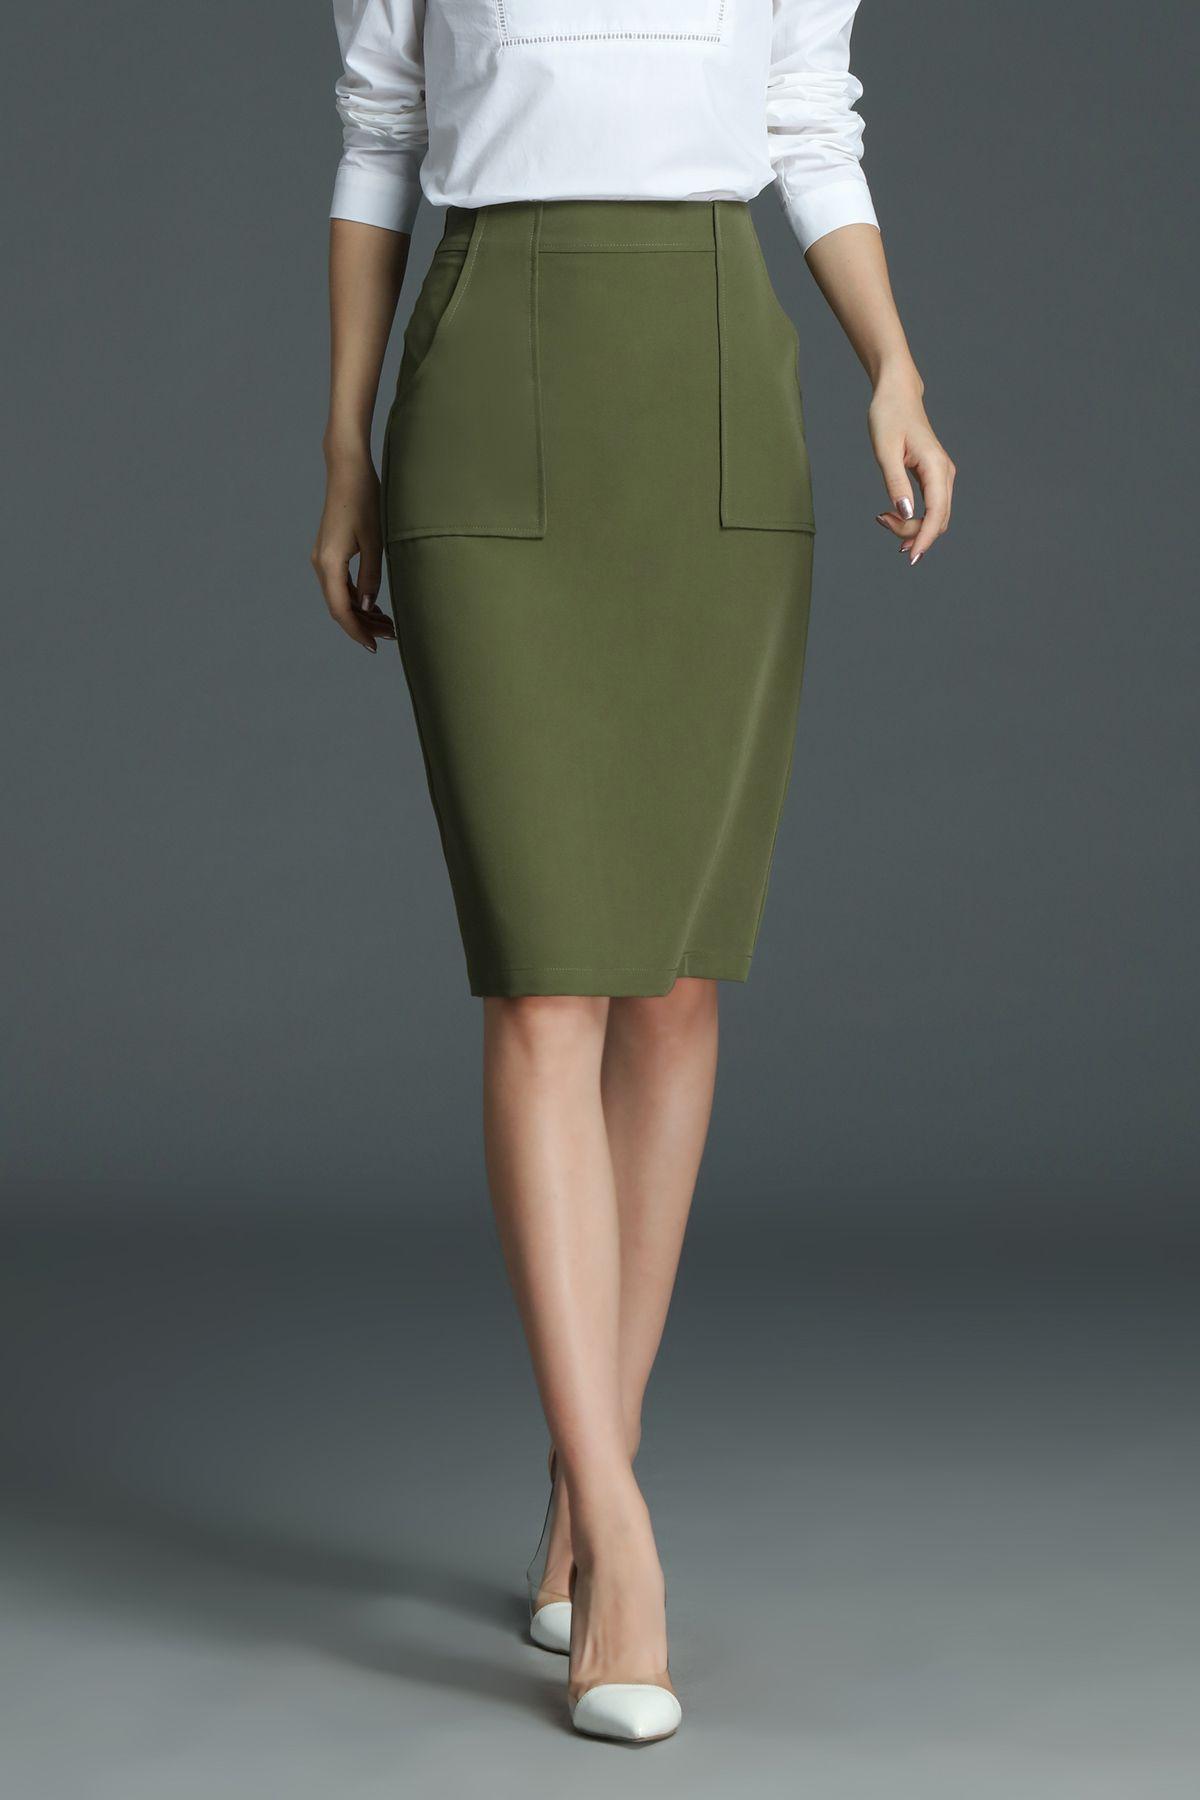 8b6856263 ROEYSHOUSE Knee Length Work Pencil Skirt | SKIRT | Fashion, Green ...